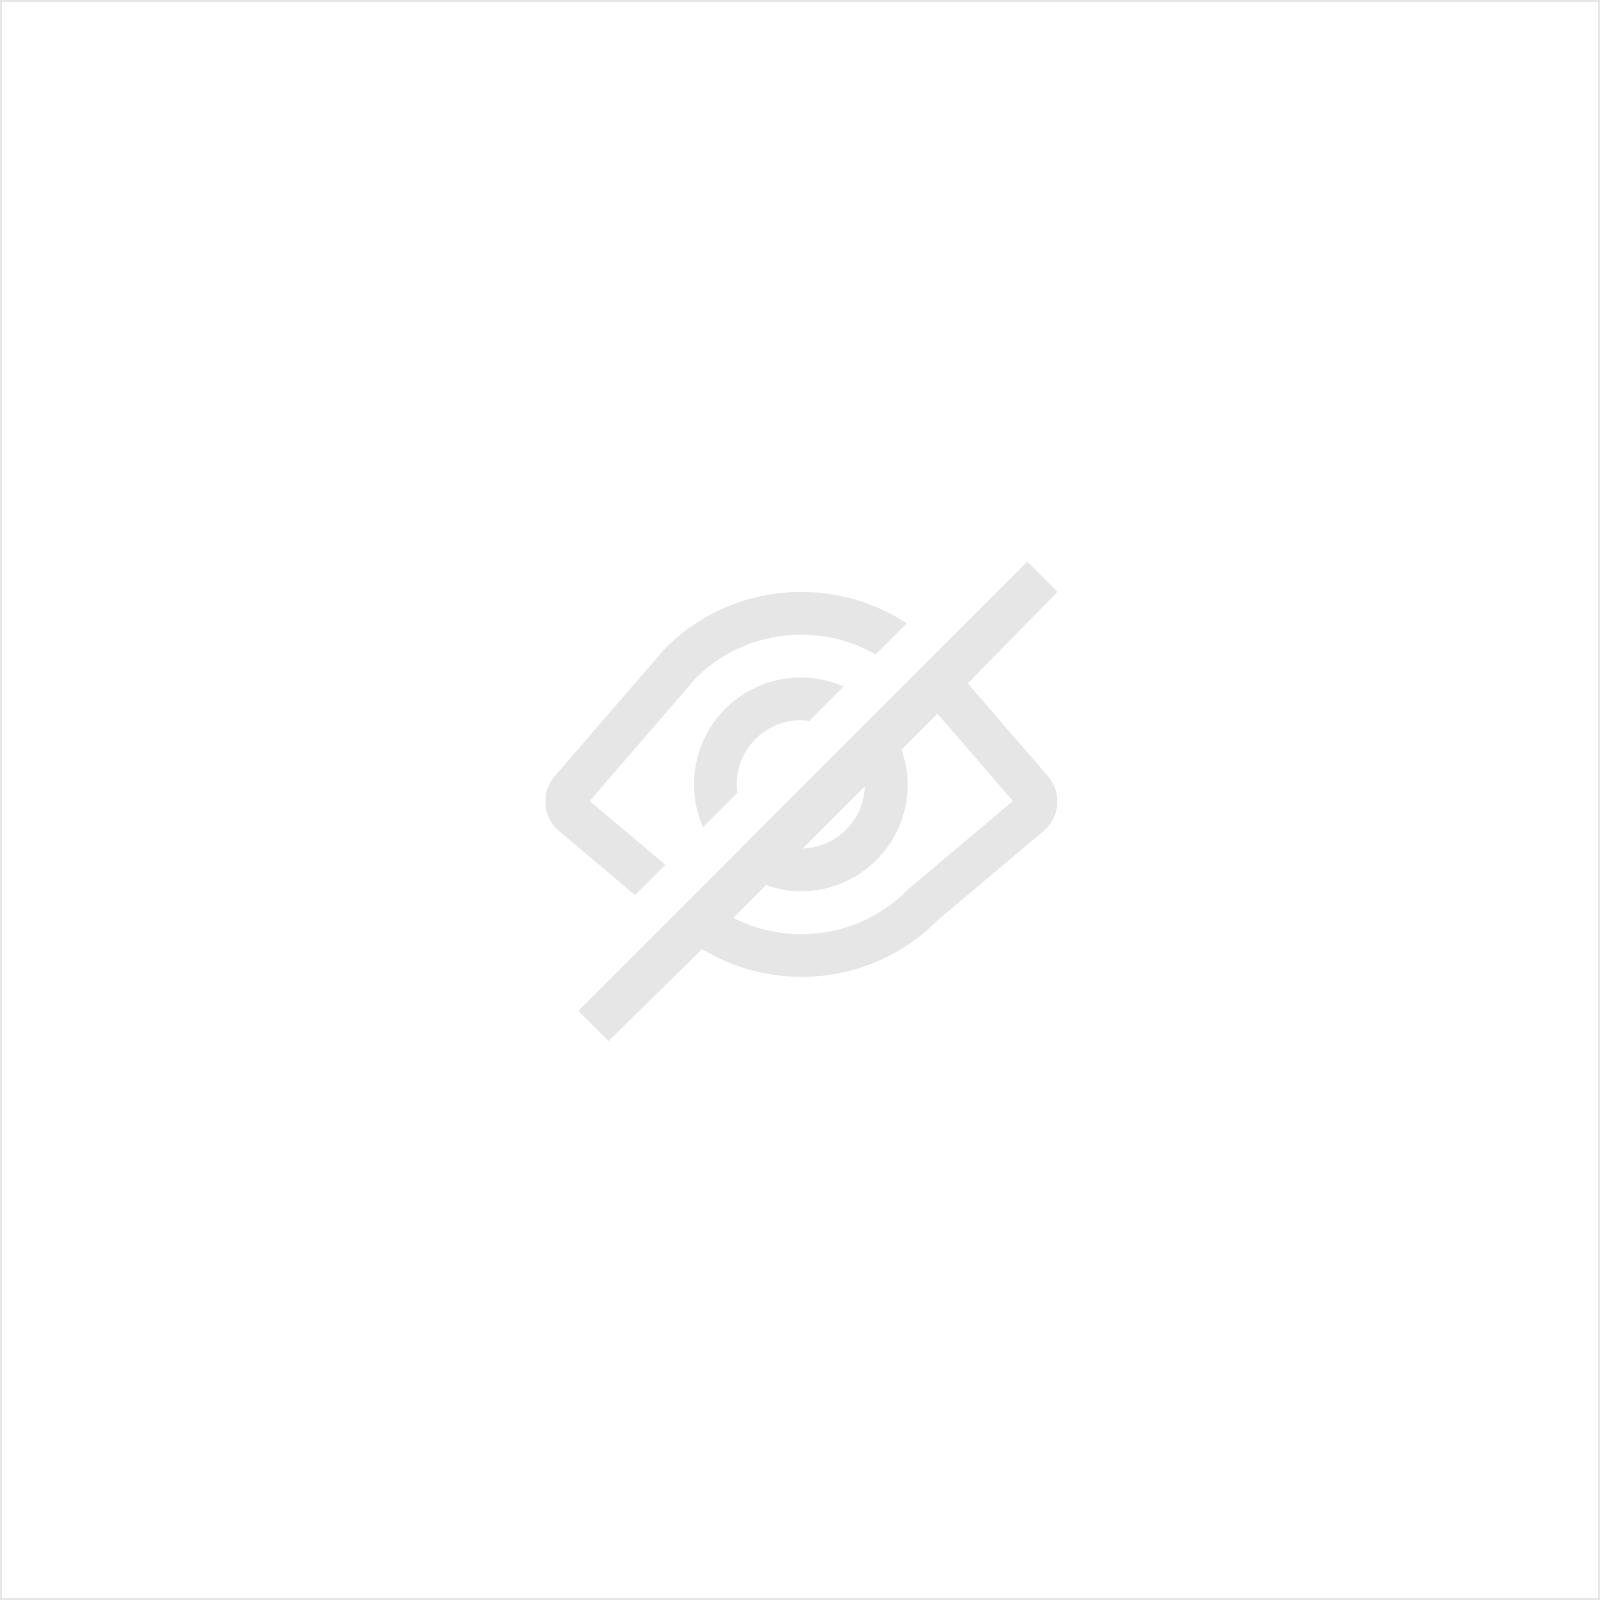 RONDE BORSTEL MET MESSINGDRAAD 200 x 20 /  0,25